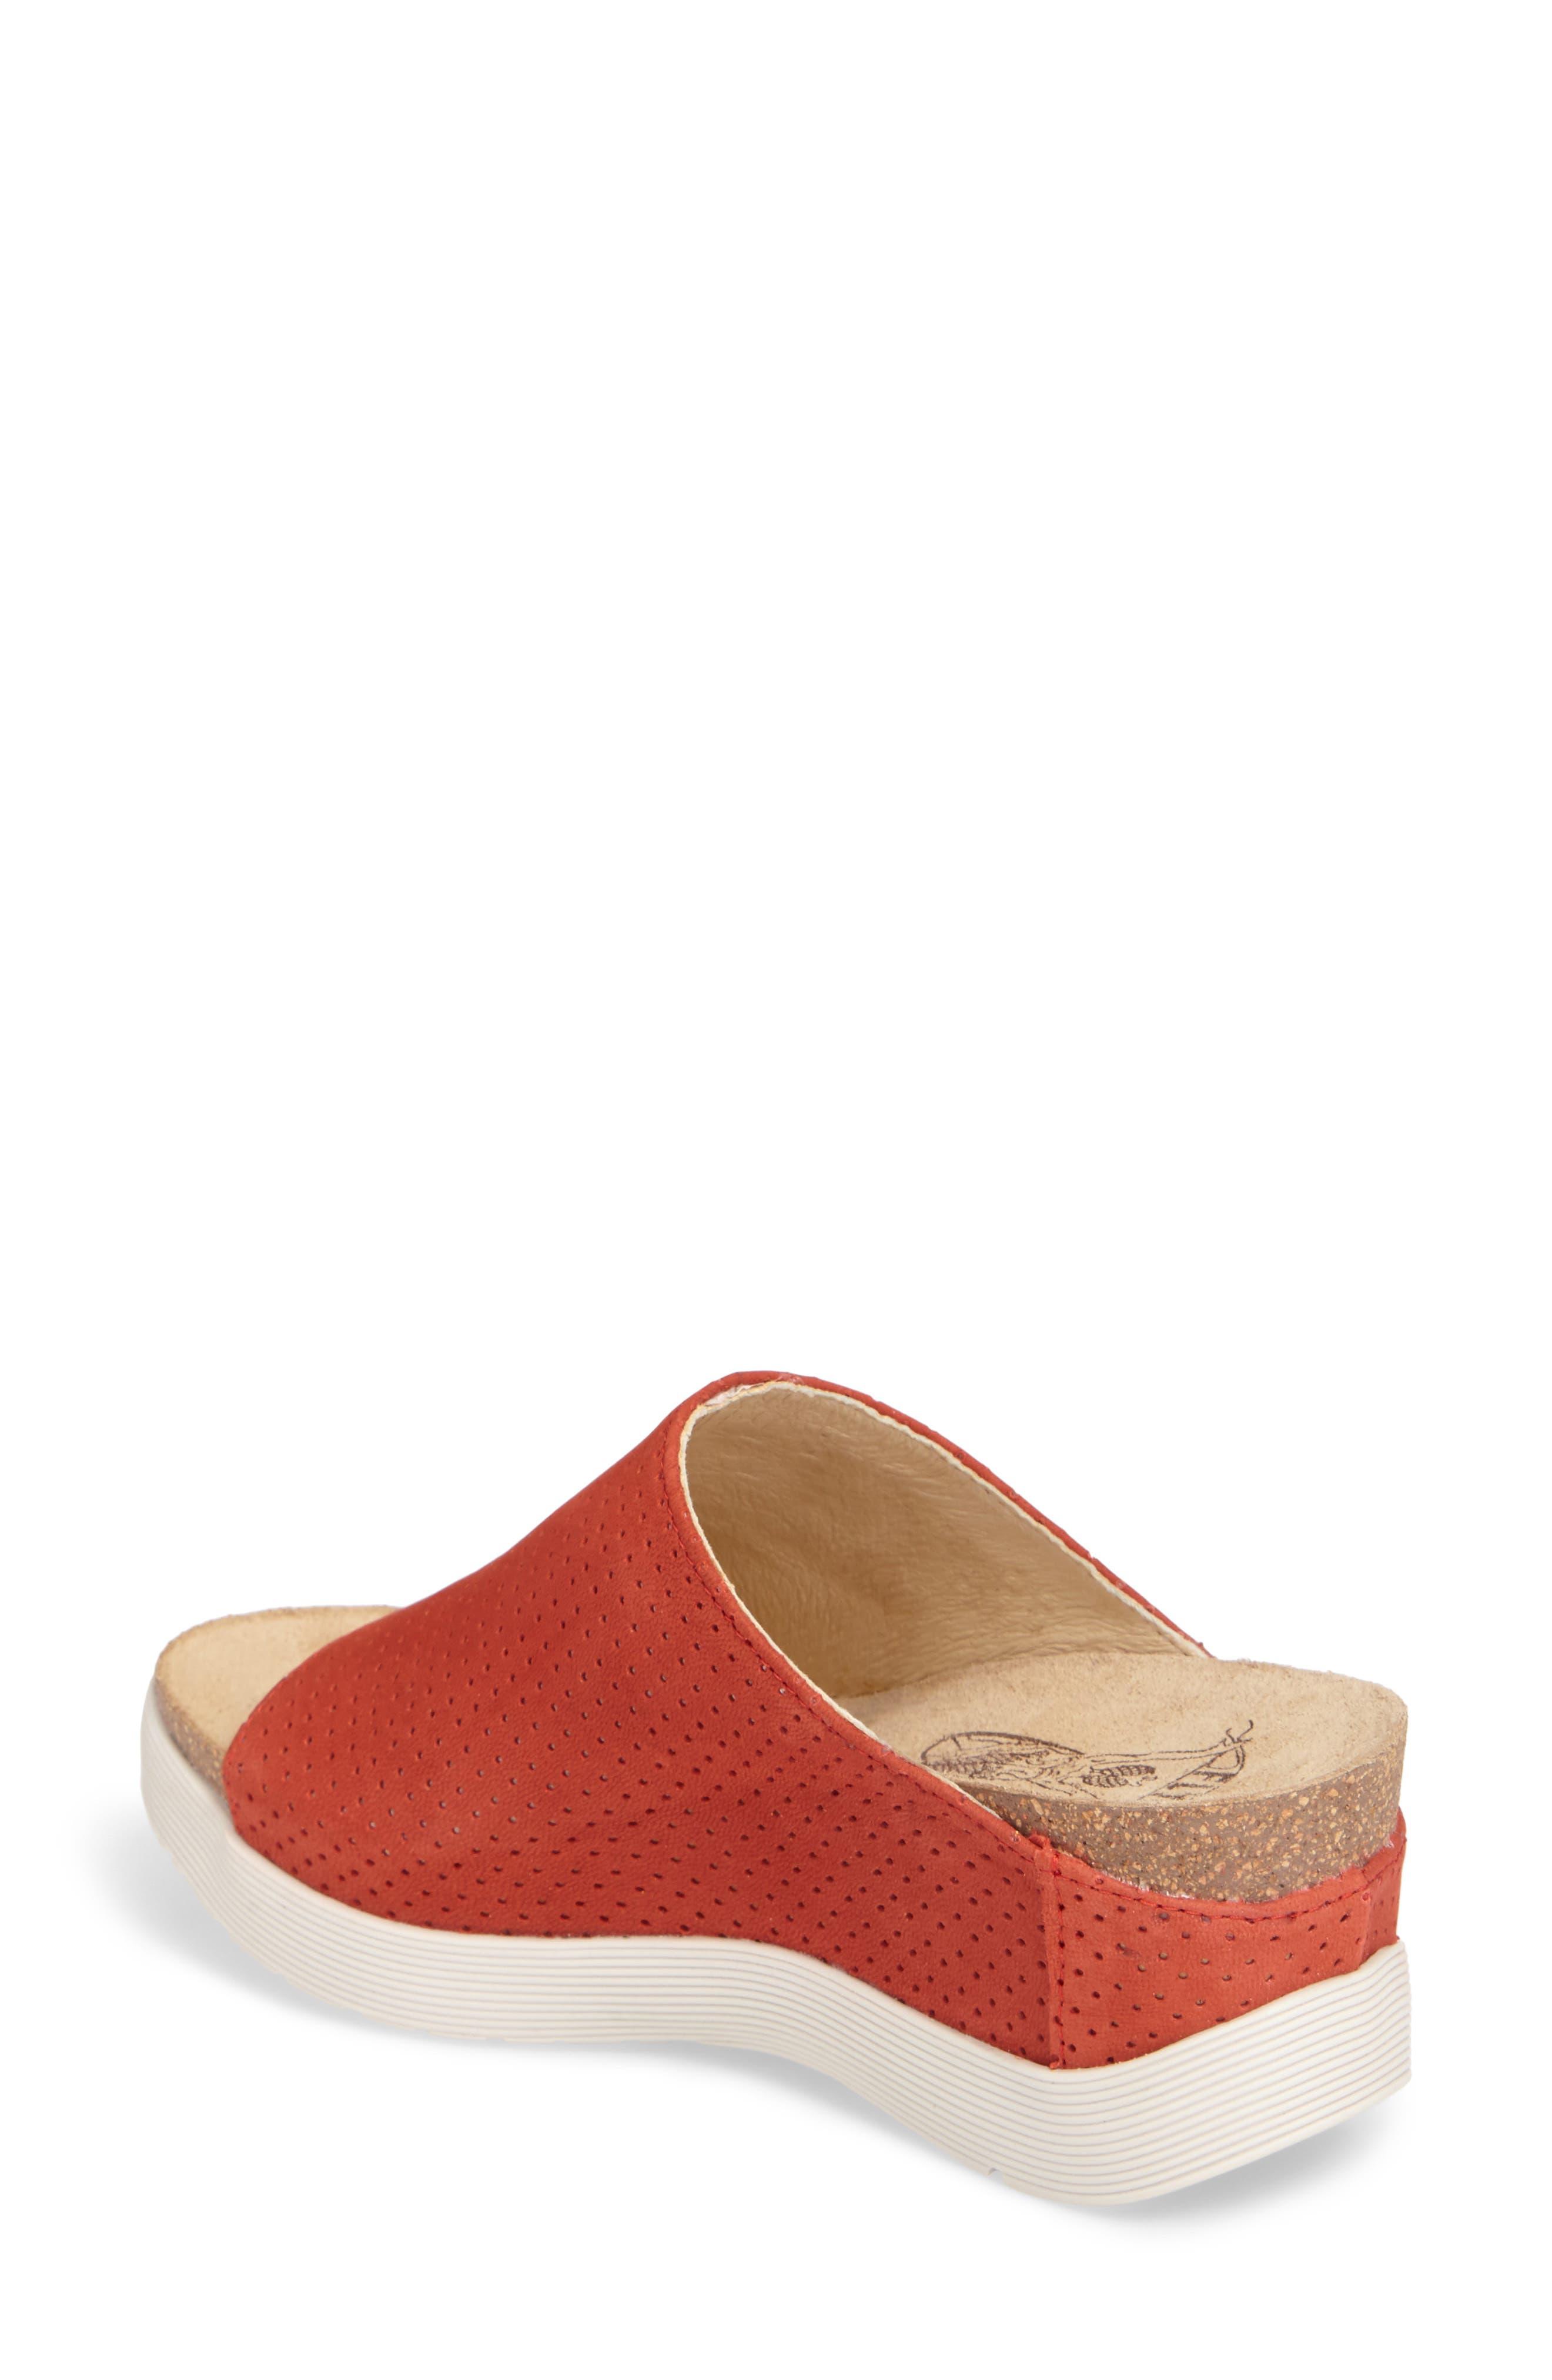 Whin Platform Sandal,                             Alternate thumbnail 2, color,                             Scarlet Cupido Leather